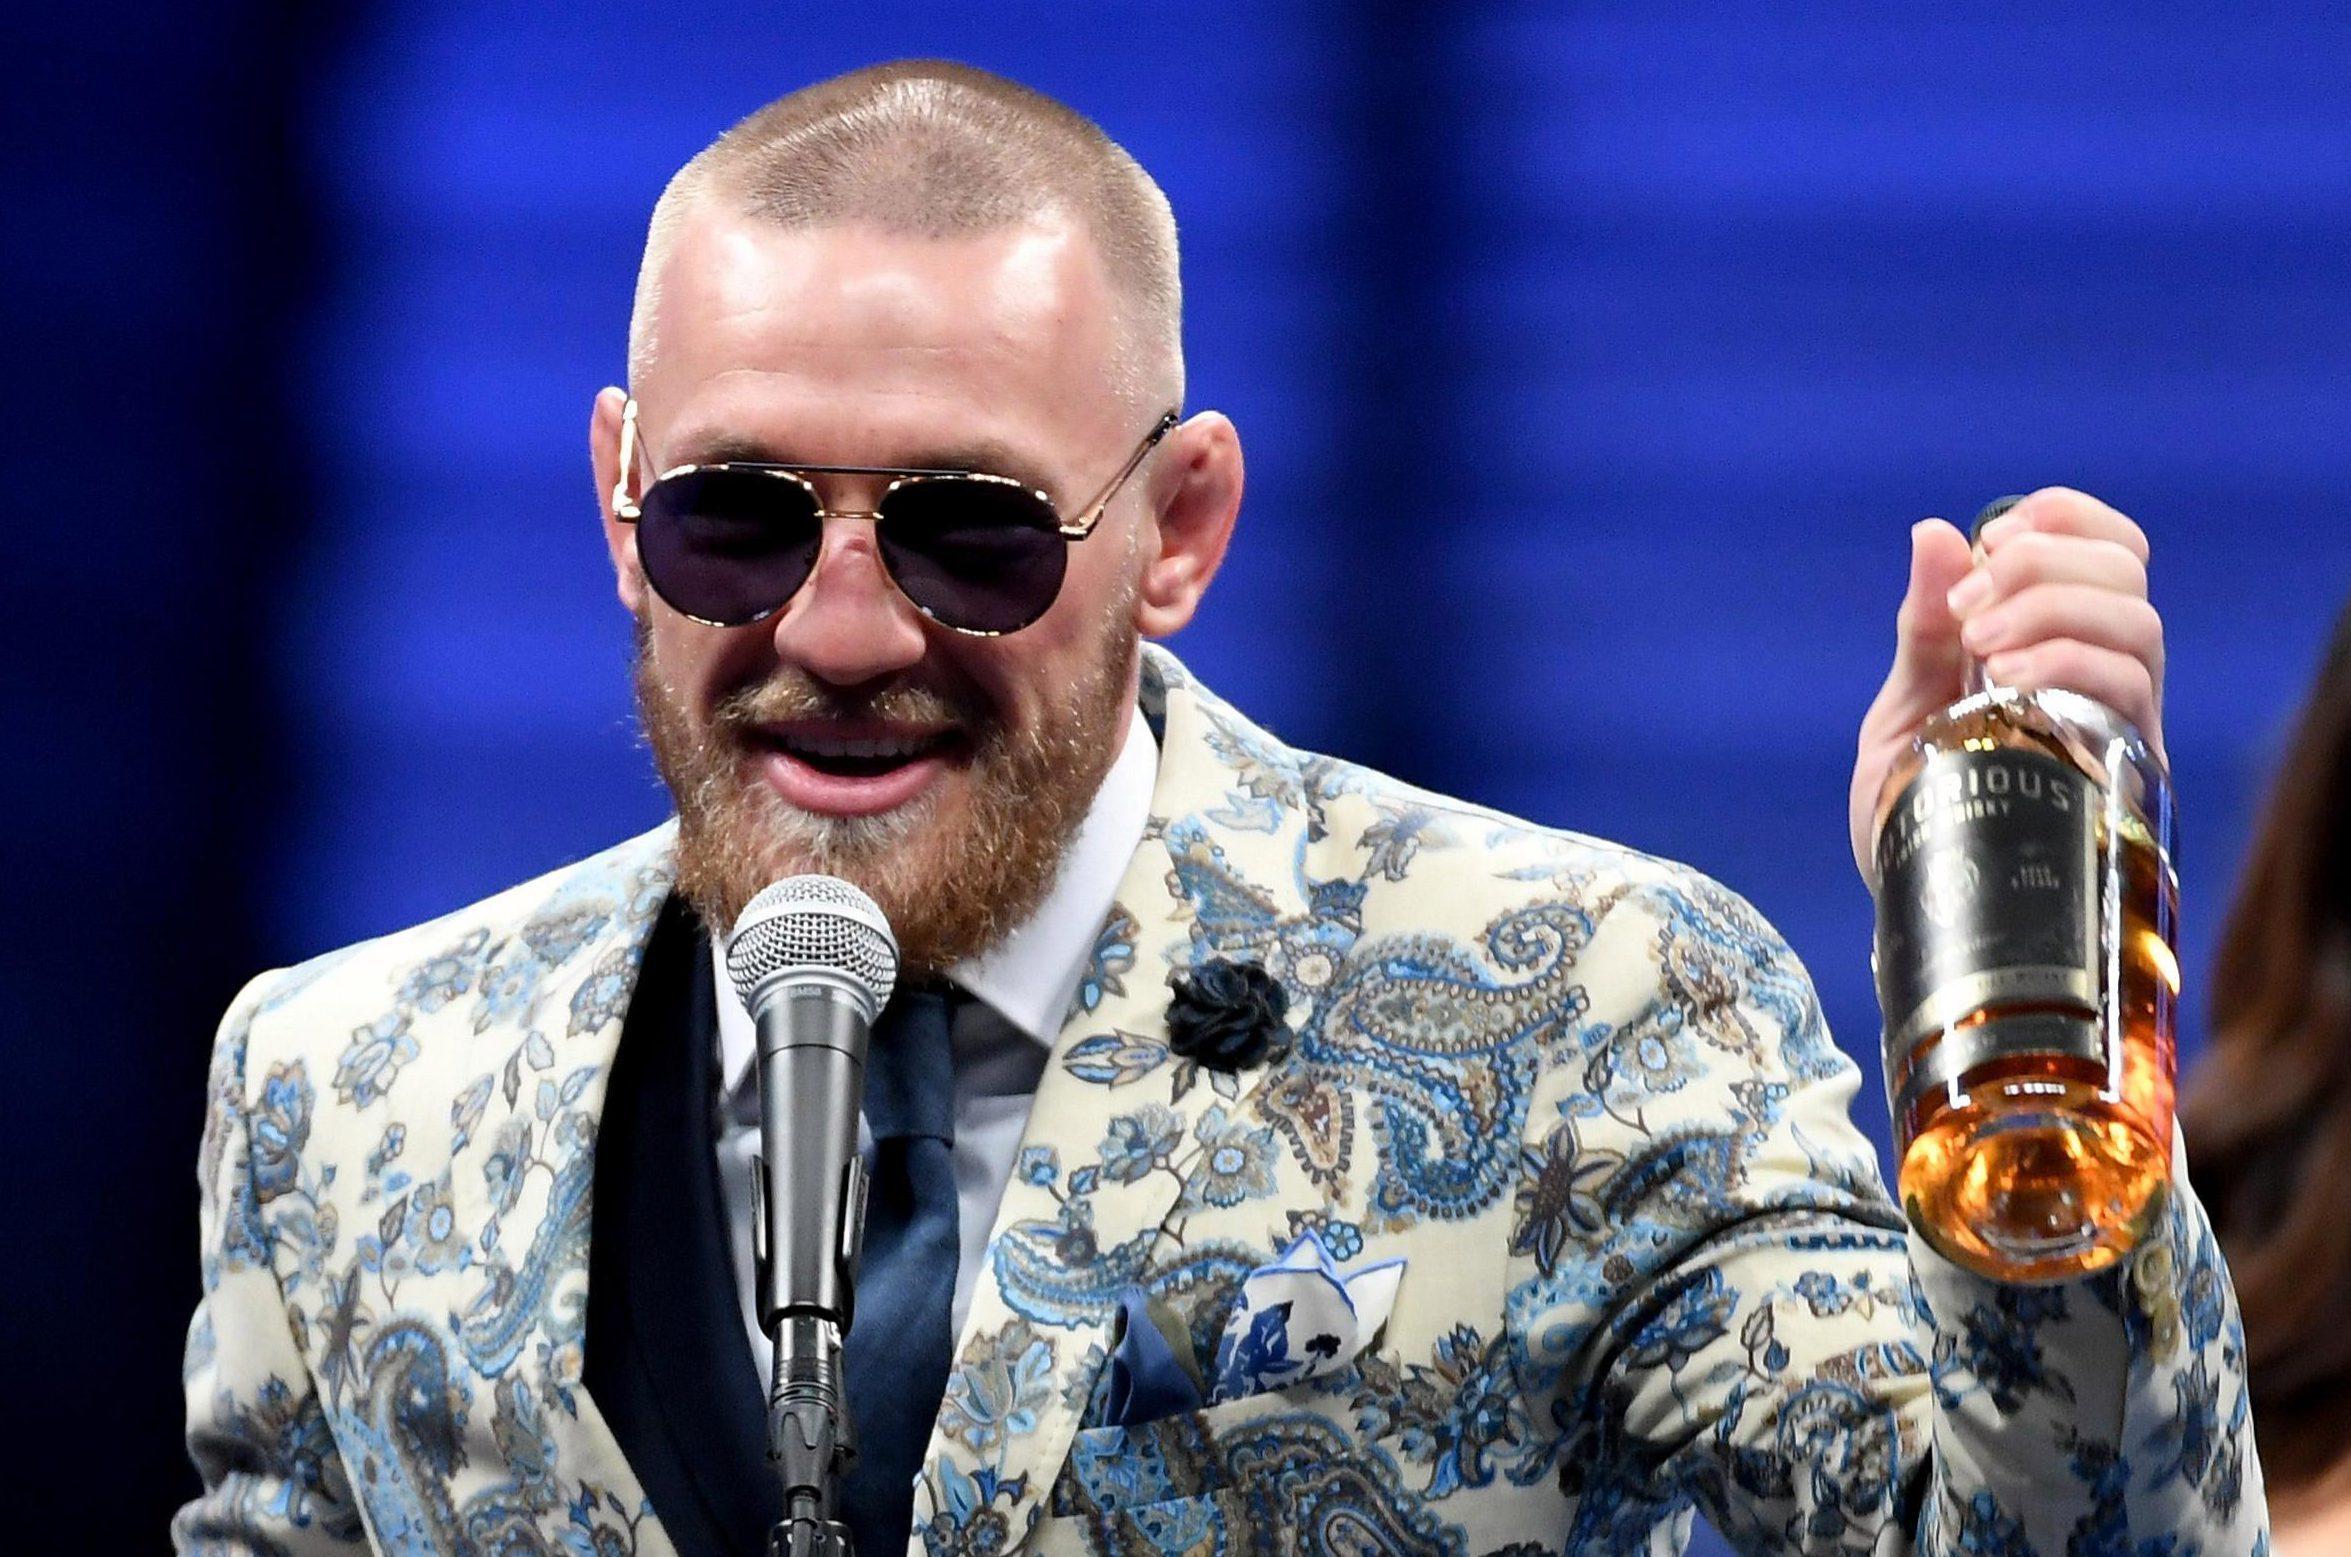 Conor-McGregor-UFC-MMA-Keynote-Speaker-Igor-Beuker